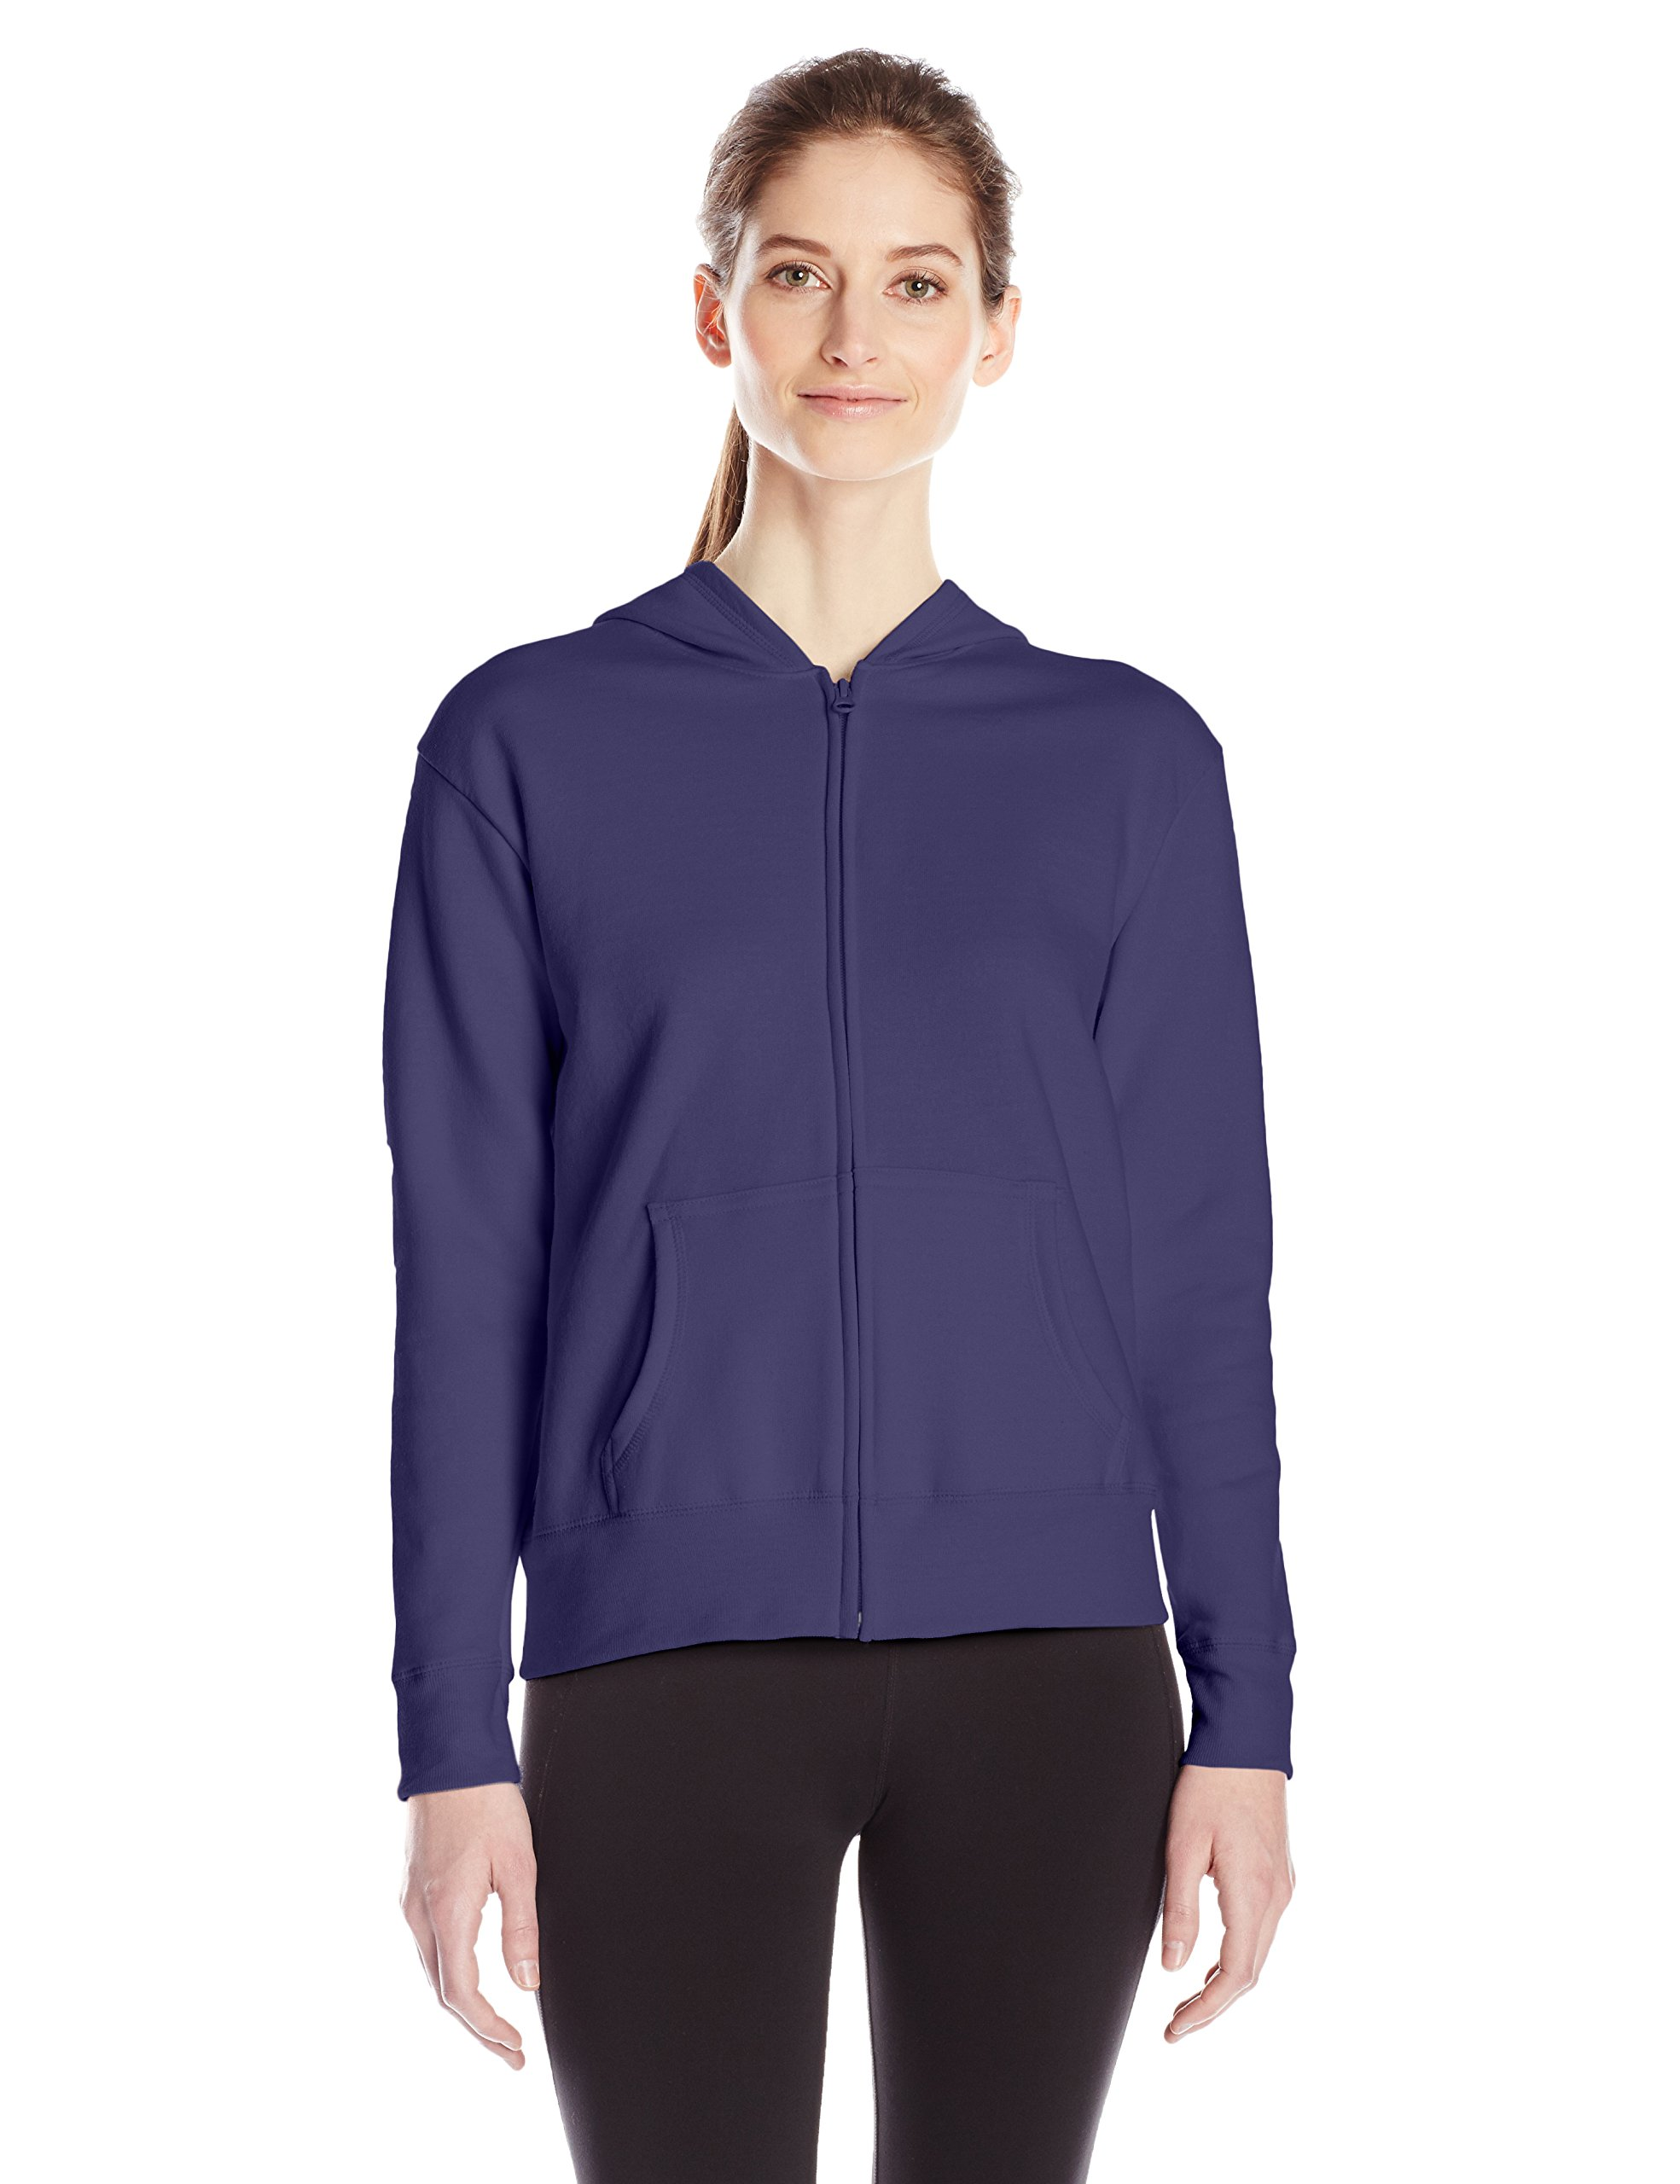 Hanes Women's Full Zip Hood, Navy, Medium